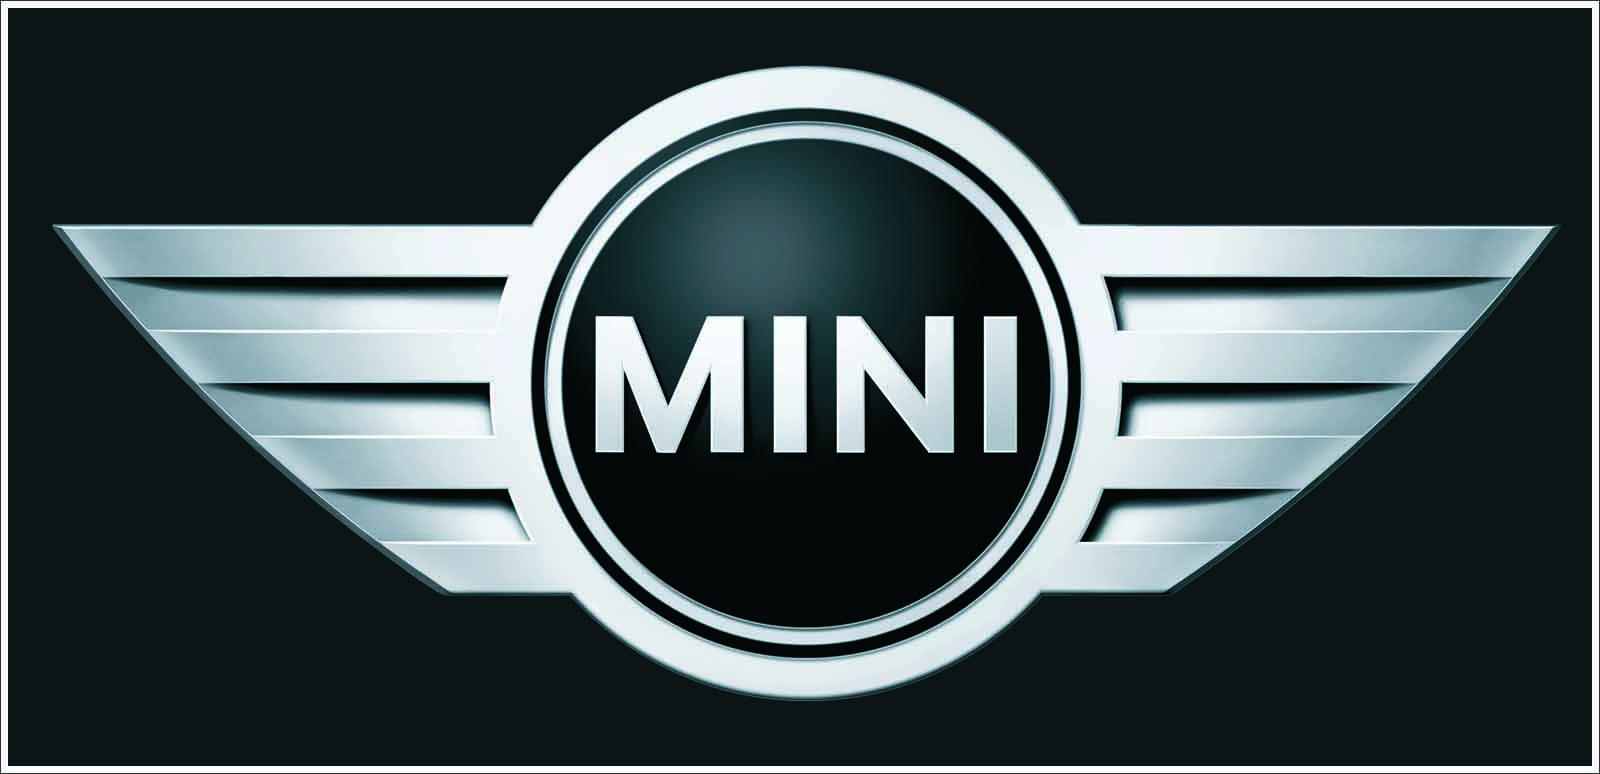 Mini Black Logo Wallpaper